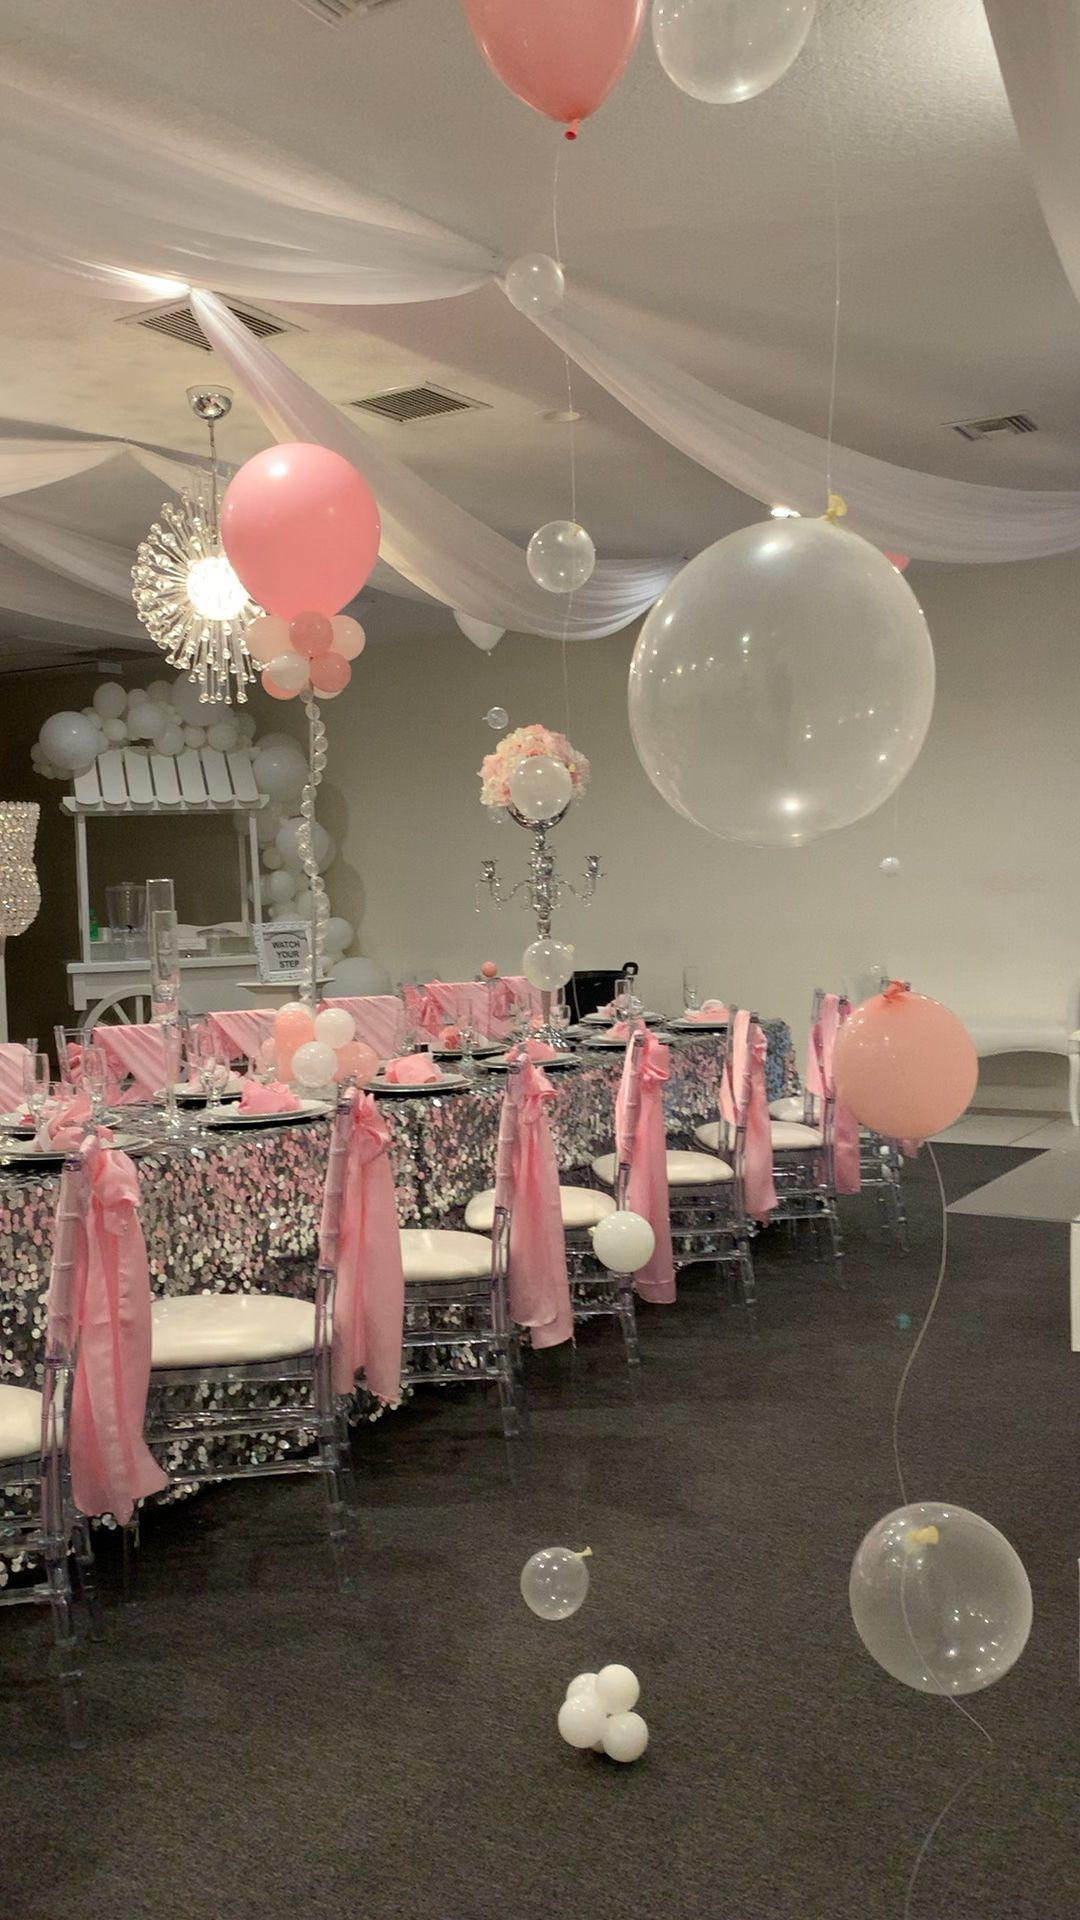 Birthday dinner party balloon decorations centerpi